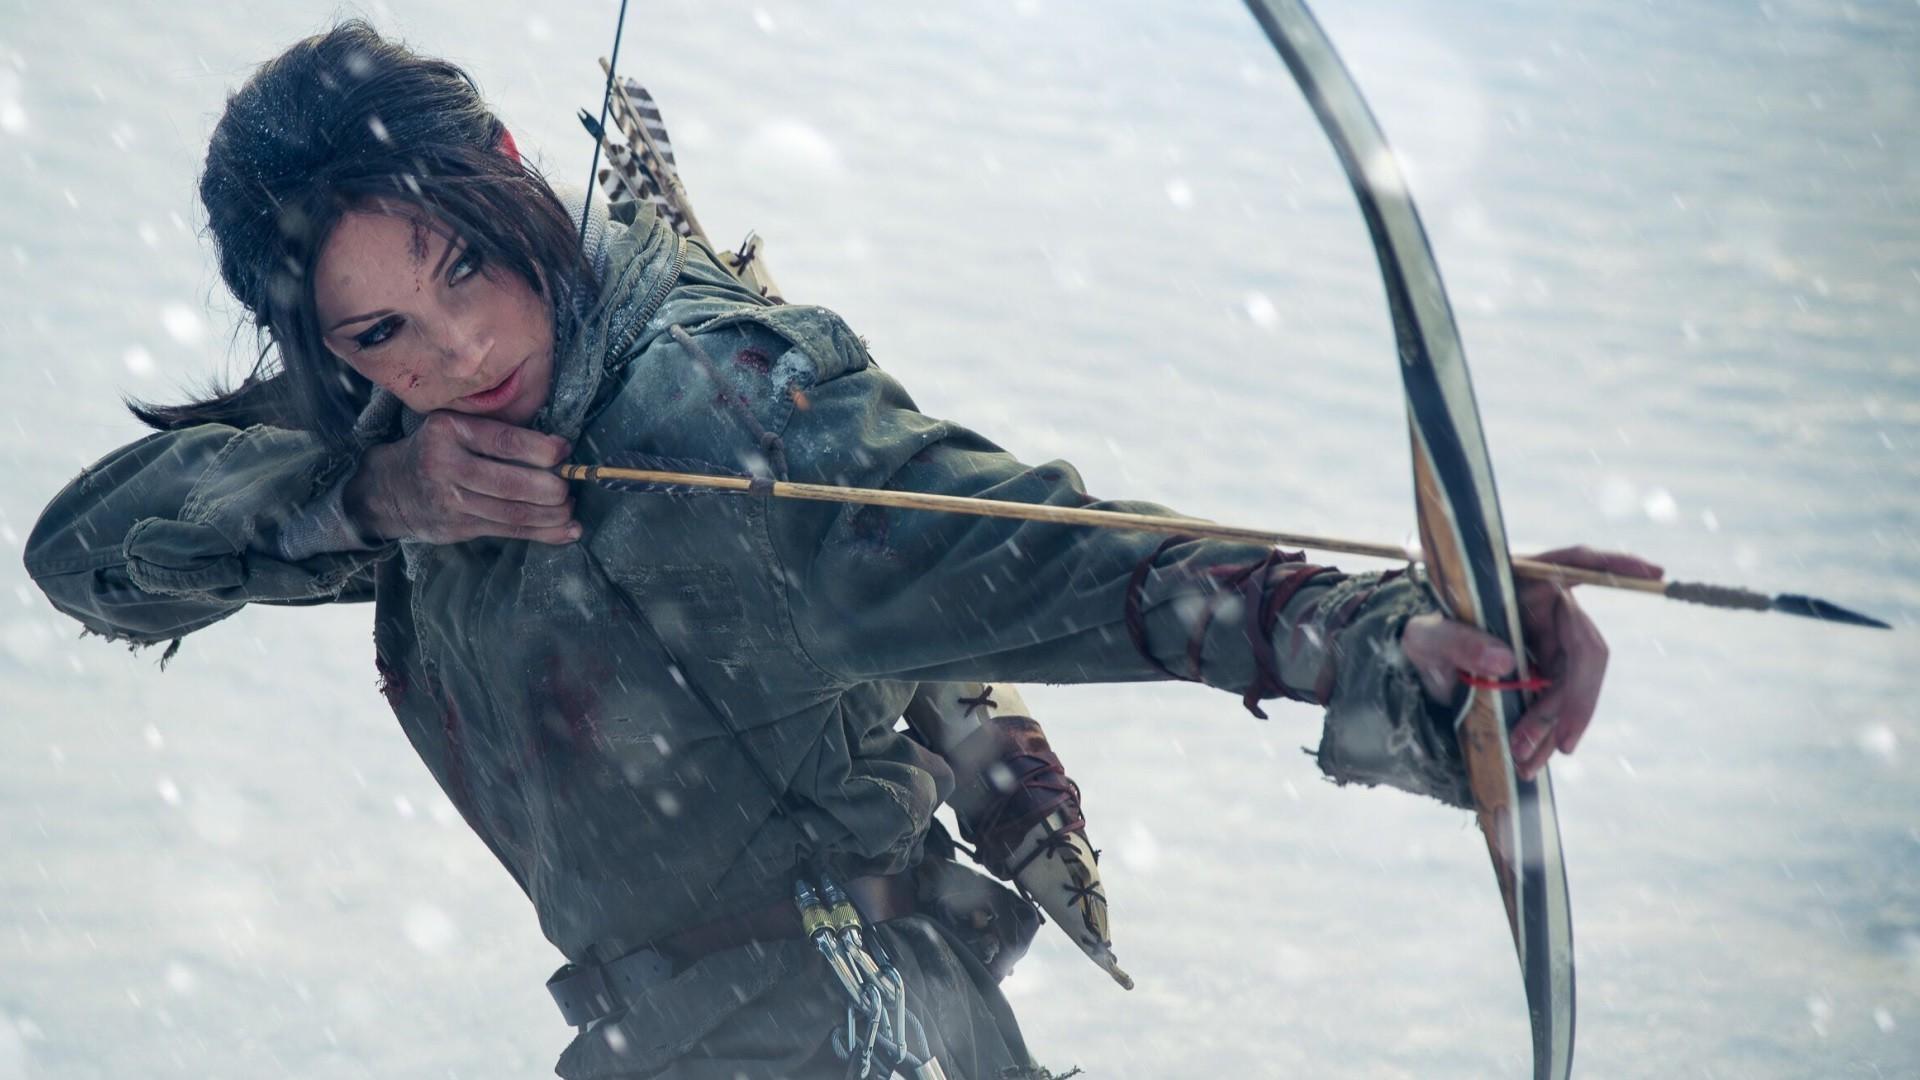 Cosplay Snow Winter Lara Croft Tomb Raider Rise Of The Screenshot 1920x1080 Px Atmosphere